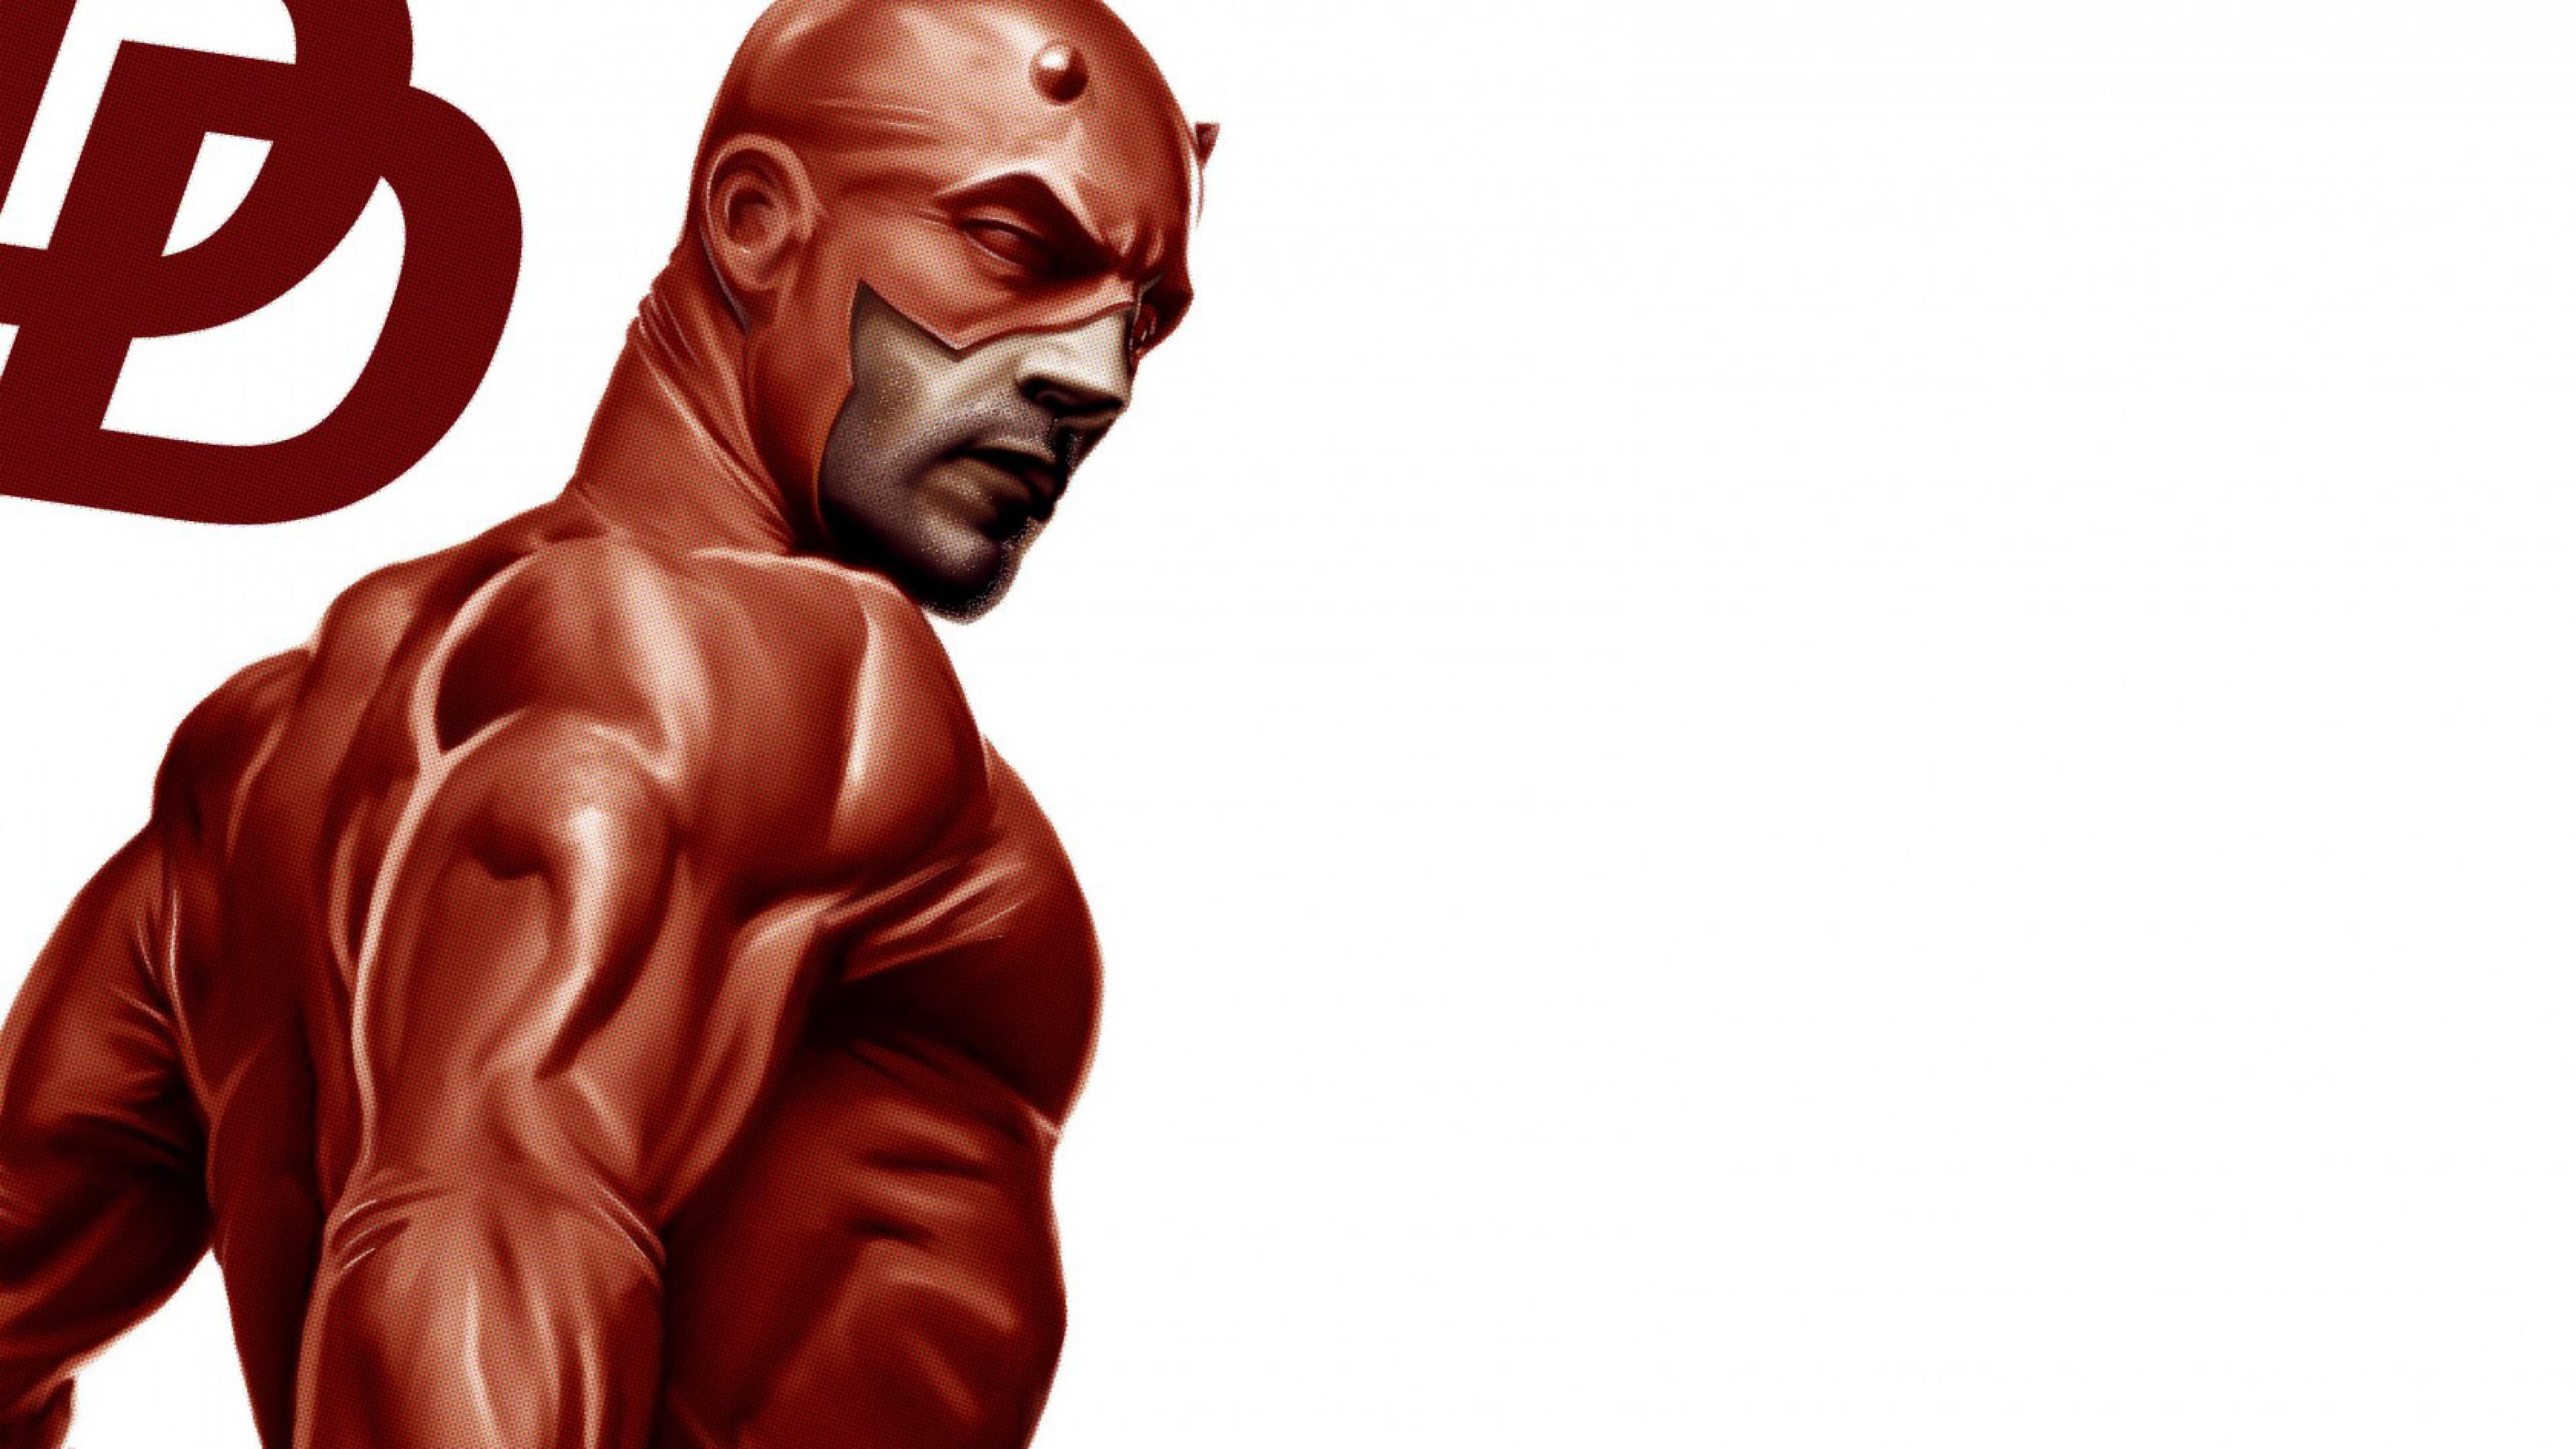 Wallpaper daredevil, marvel comics, matt murdock, costume, art